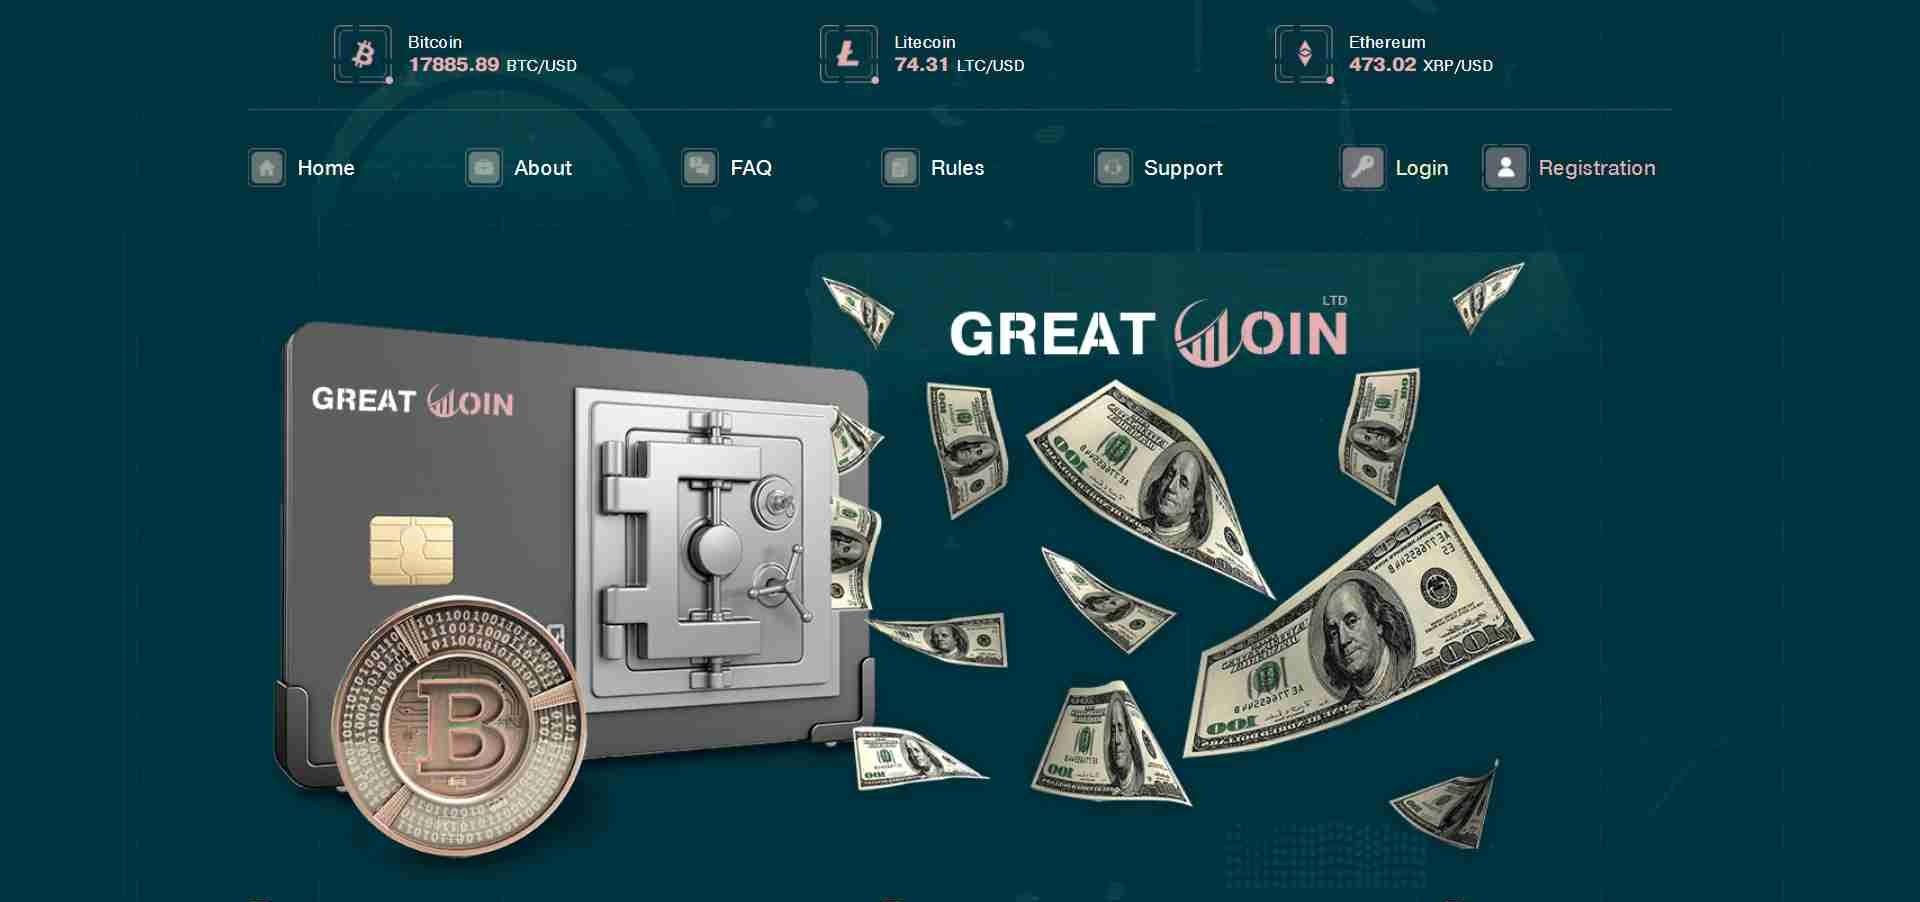 Great Coin Ltd